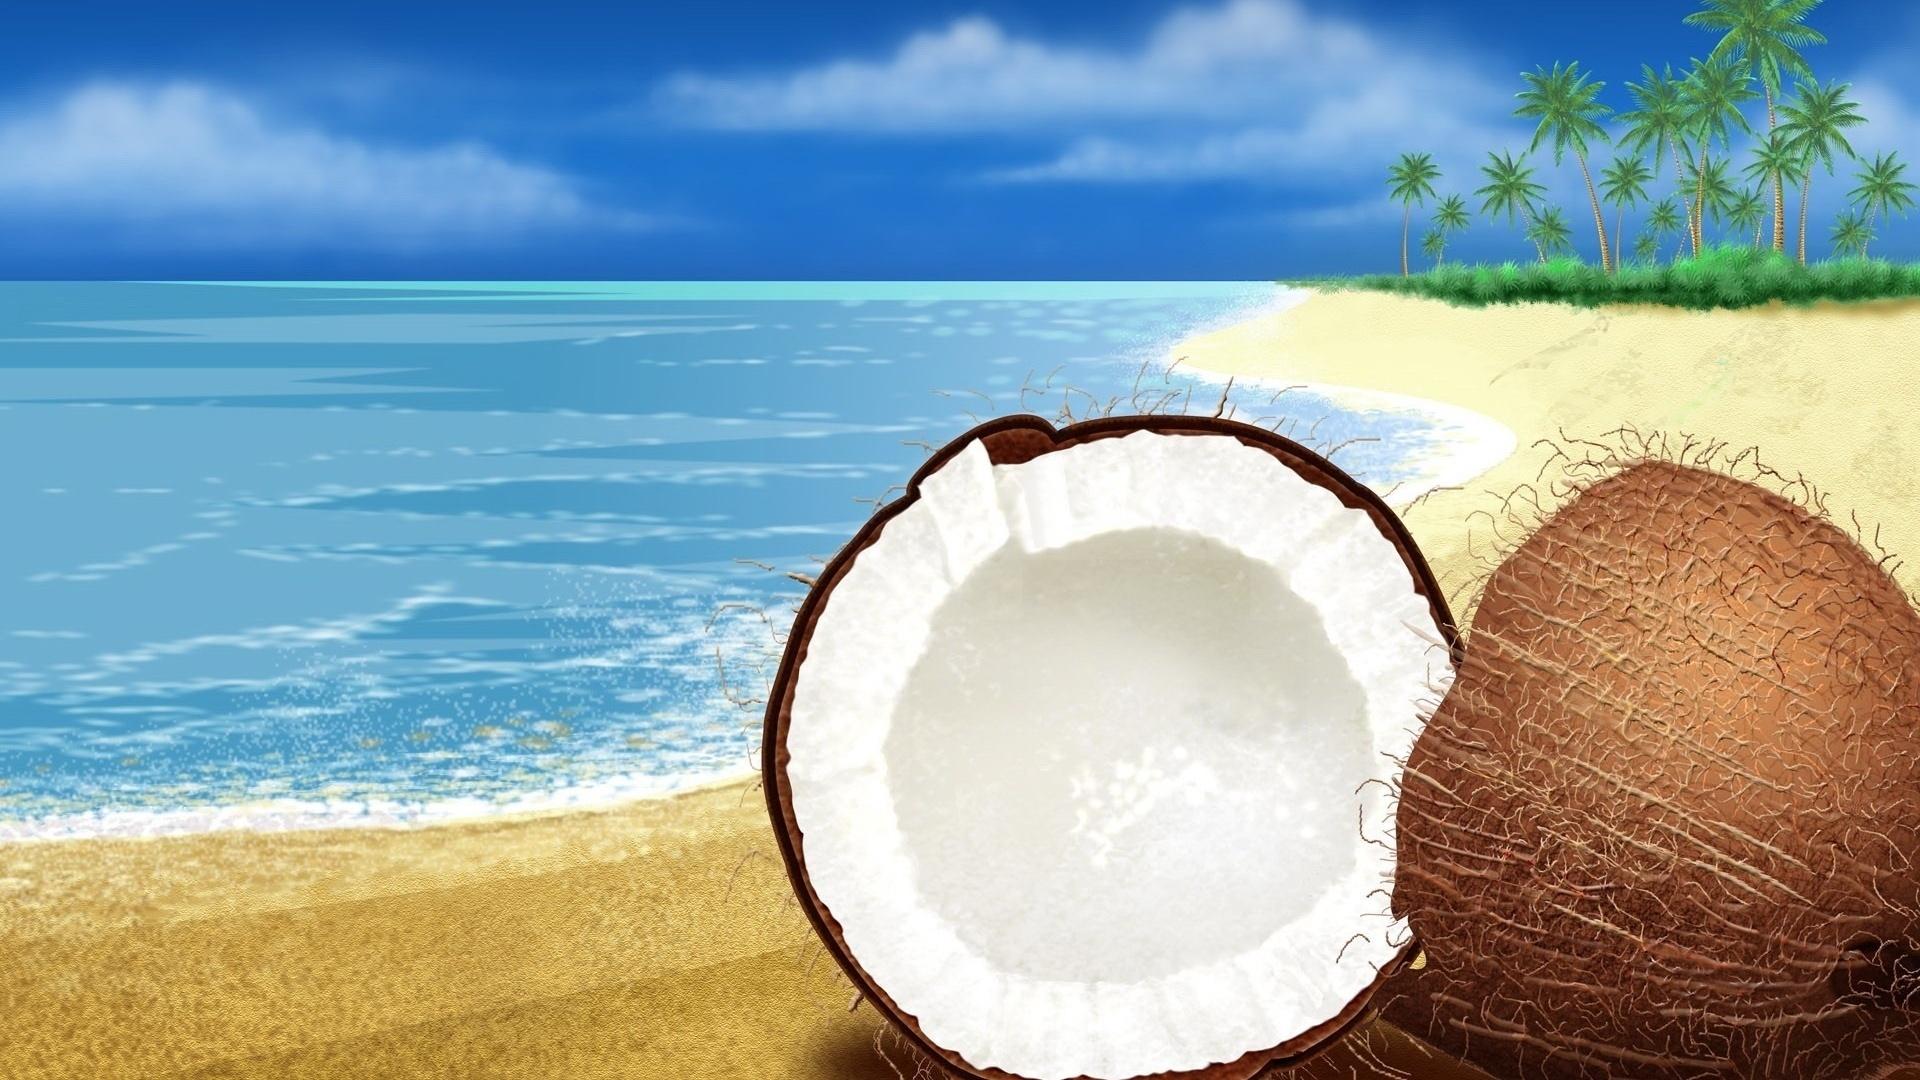 Coconuts By The Sea pc wallpaper